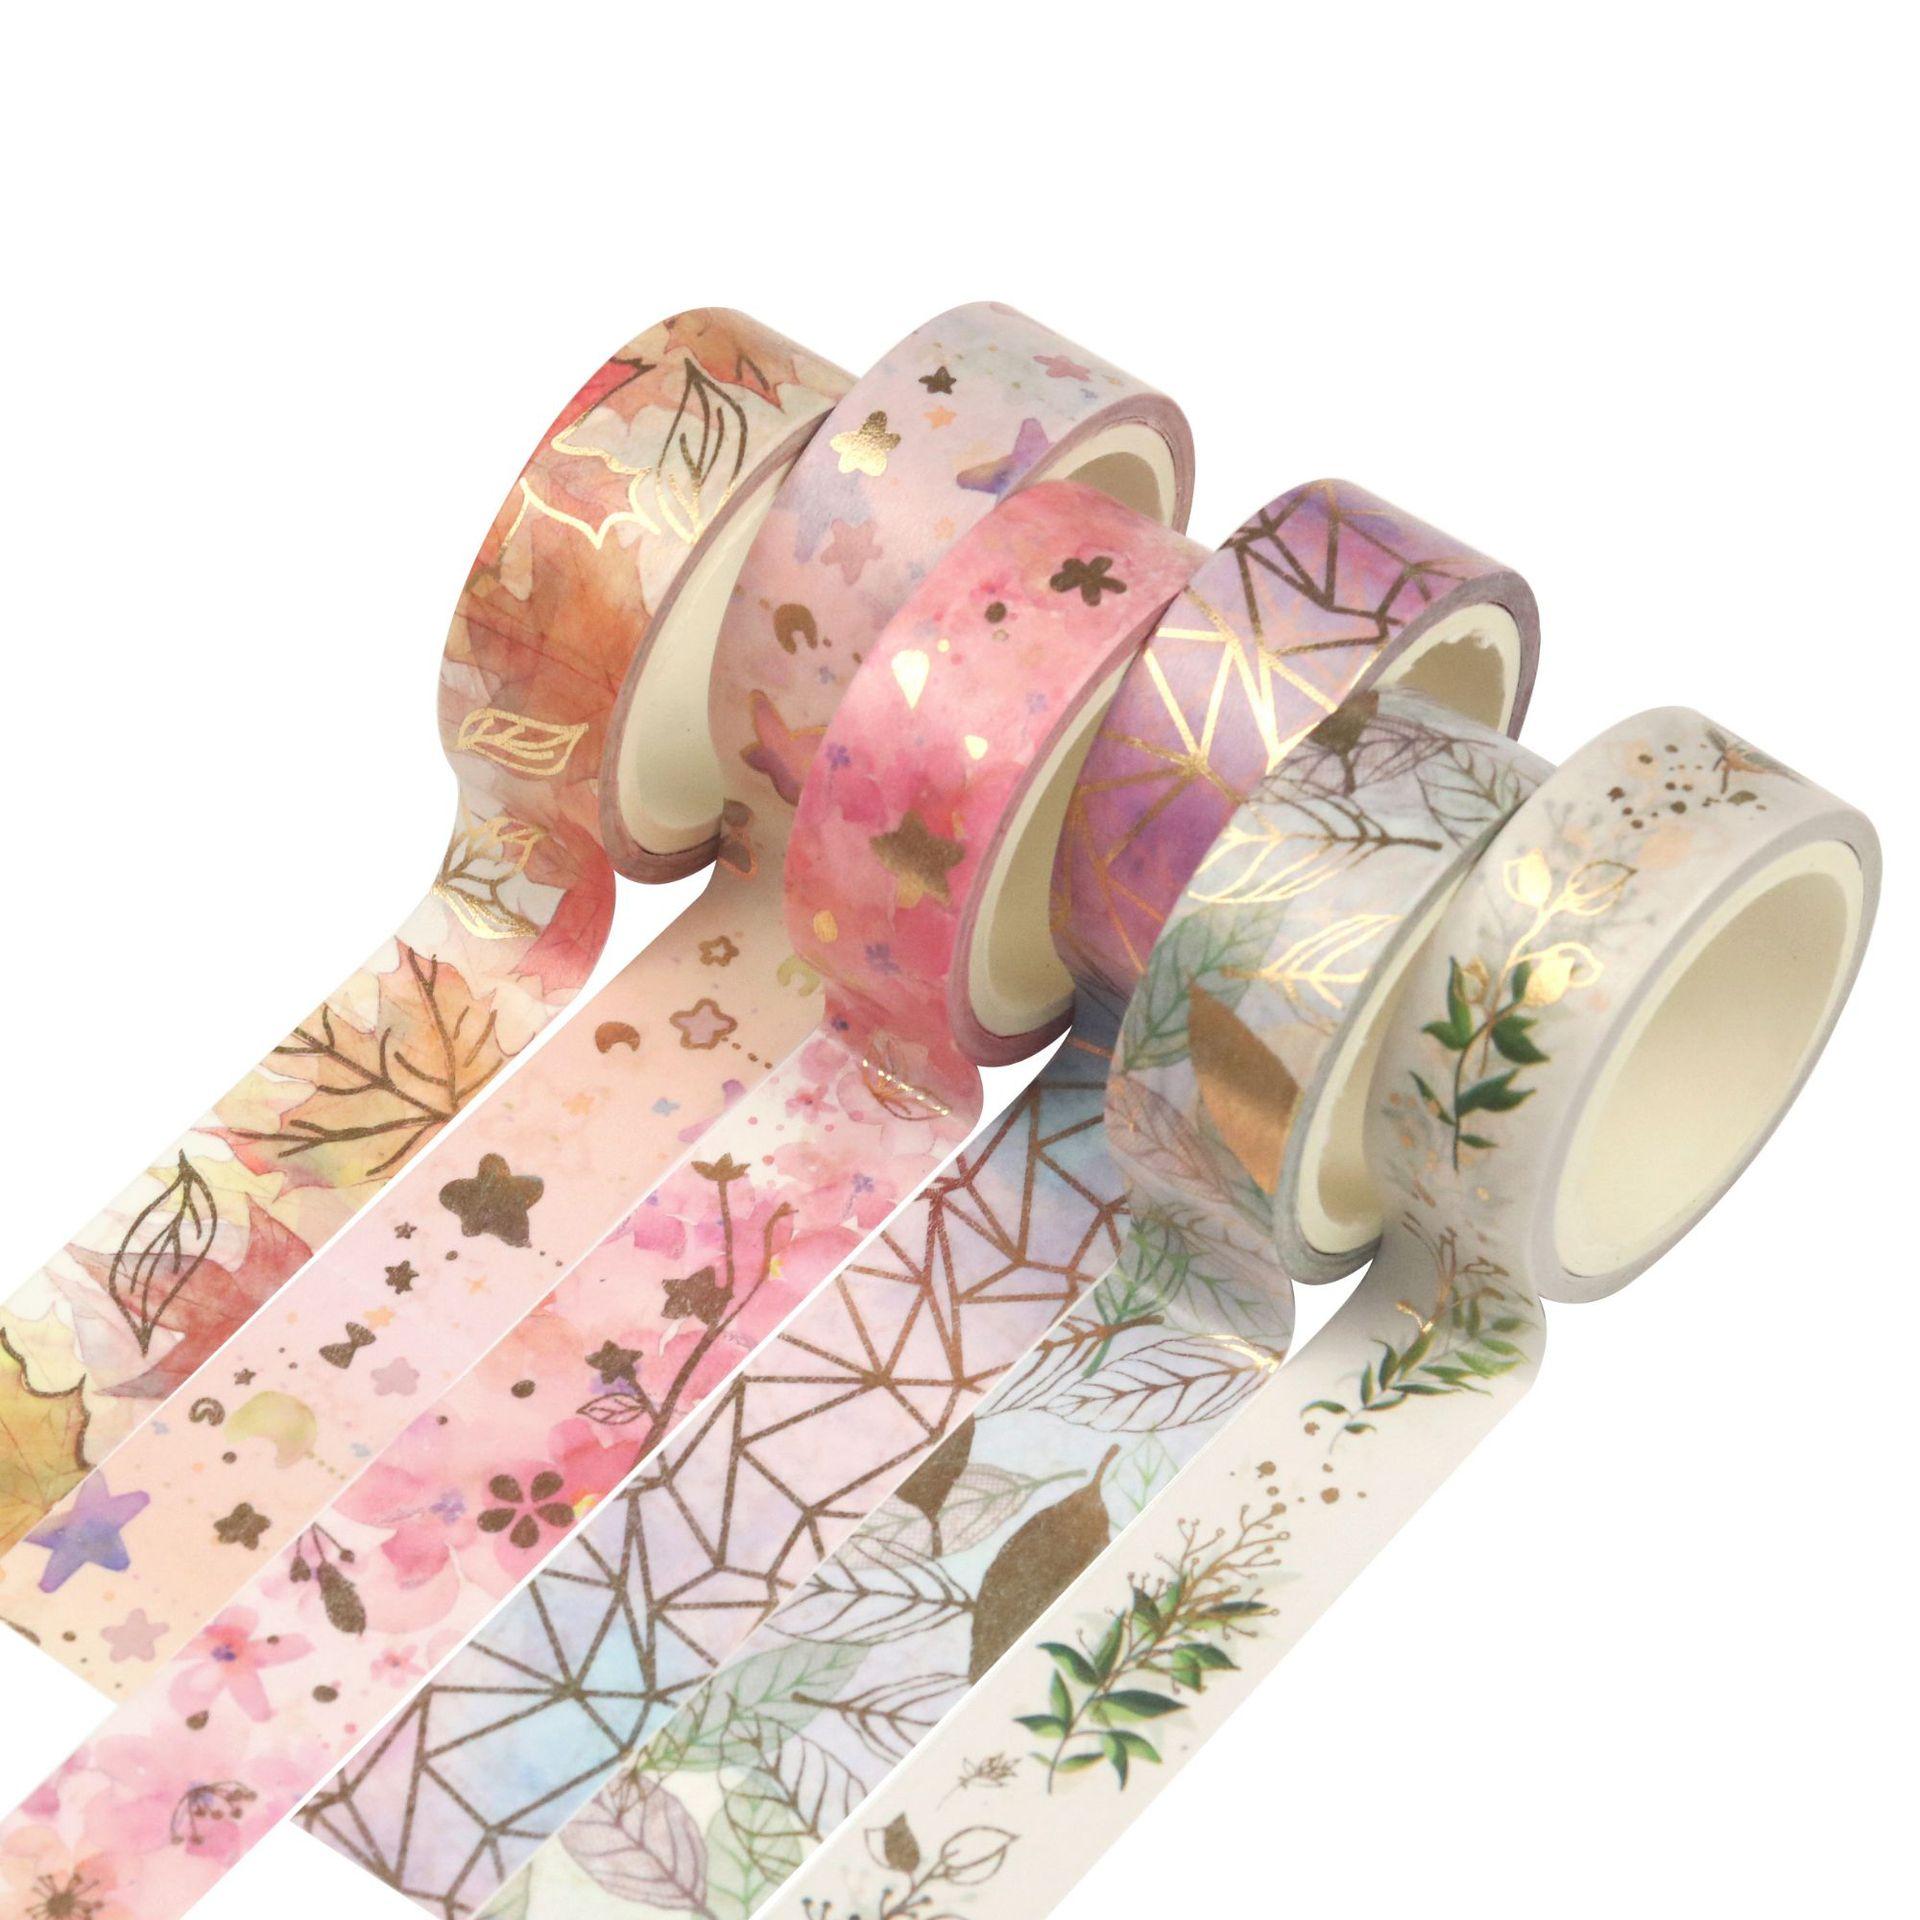 6Rolls/Set Flower Foil Washi Tape Floral Decorative Tape Scrapbooking Photo Album School Tools Kawaii Scrapbook Paper Gift Set